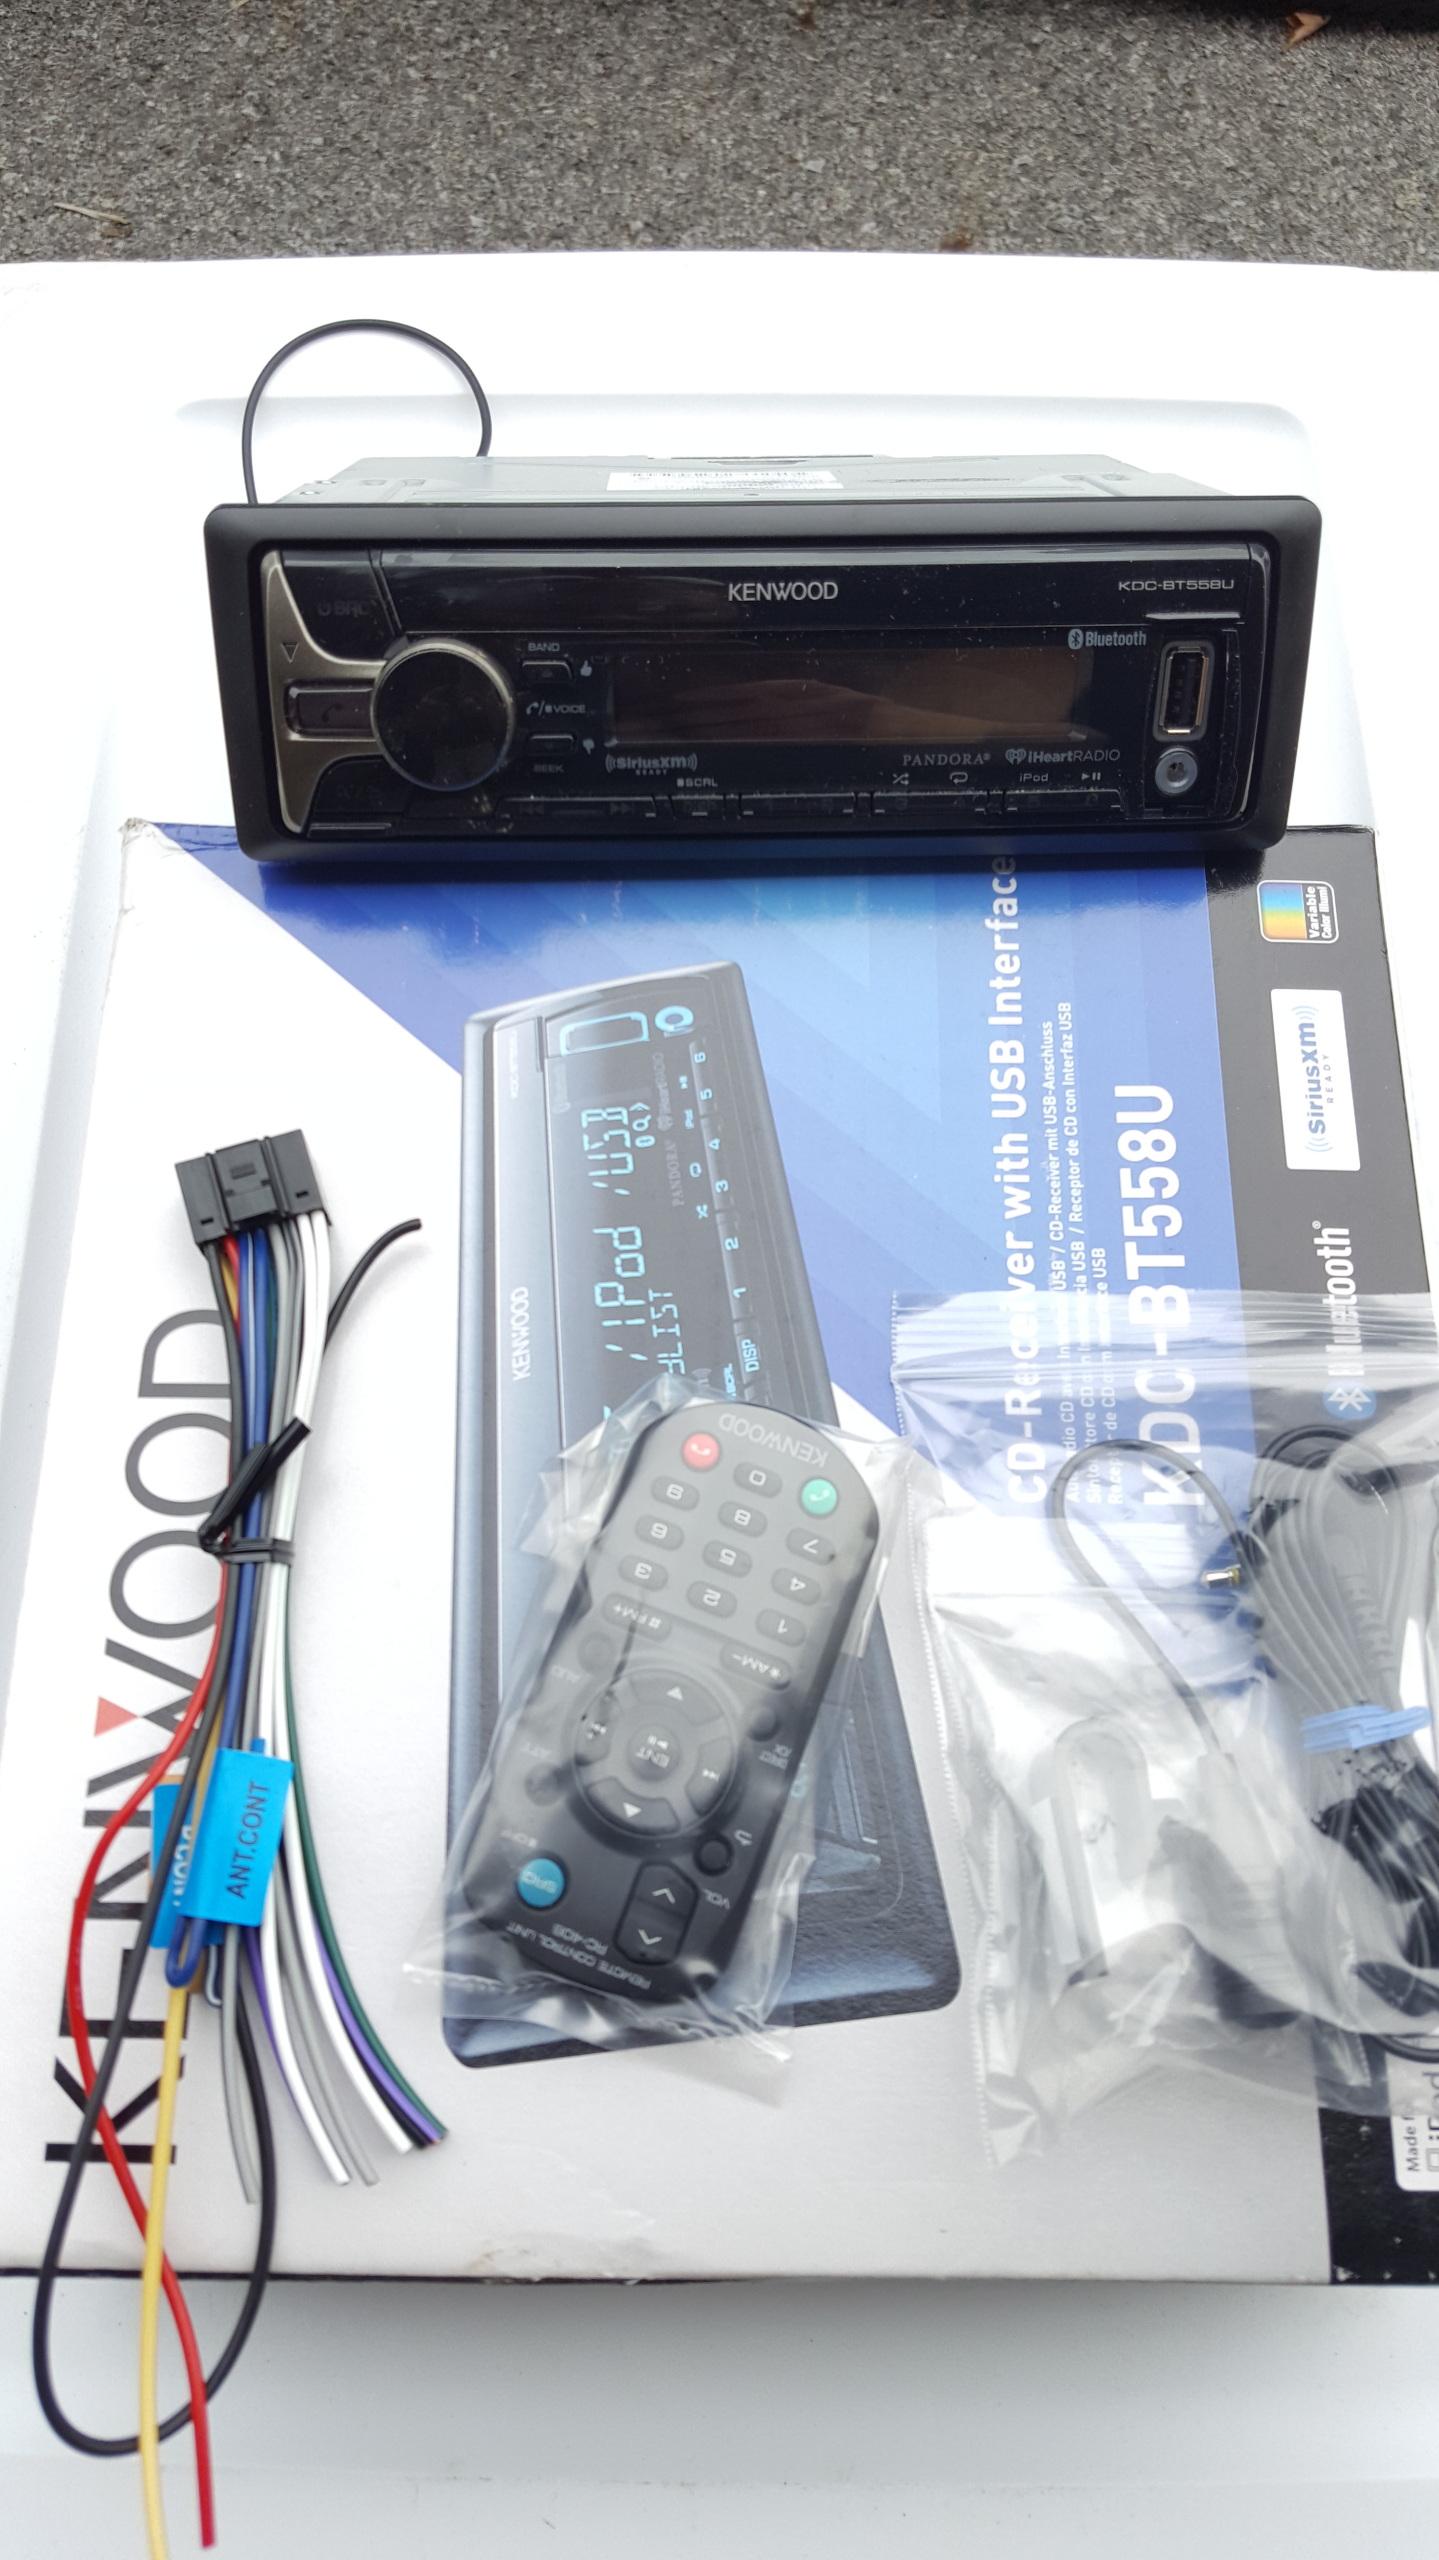 Kenwood Car Stereo Wiring Harness Diagram Kdc Bt558u ... on